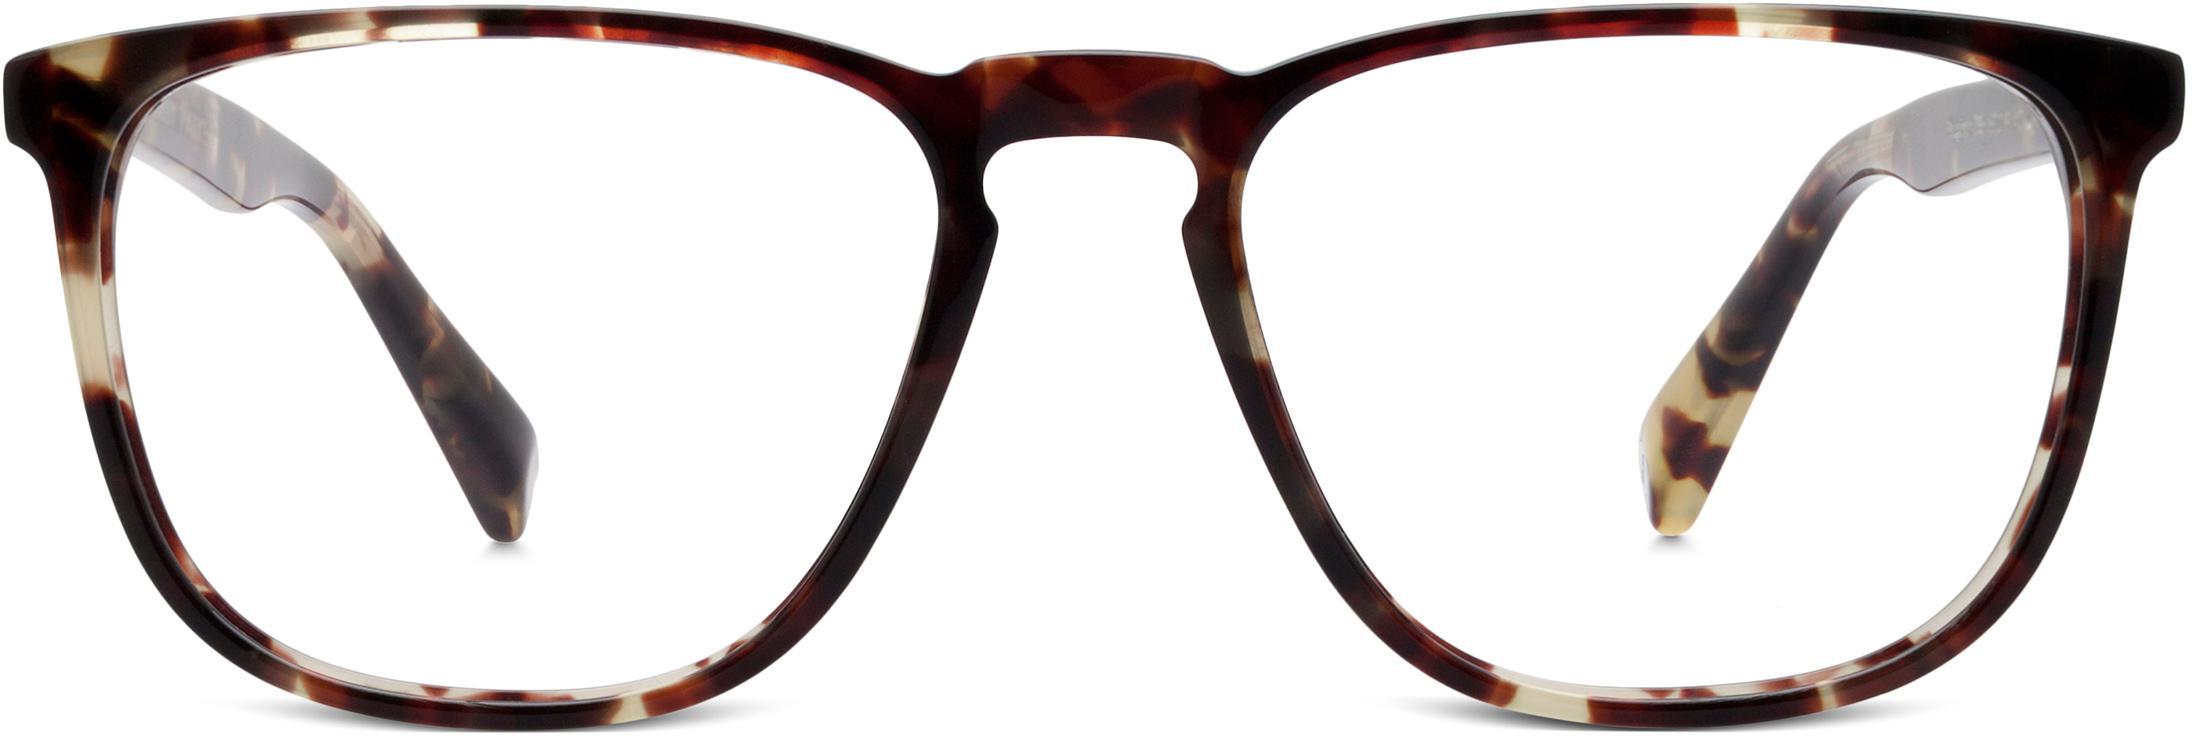 47d996fa46 Men s Eyeglasses